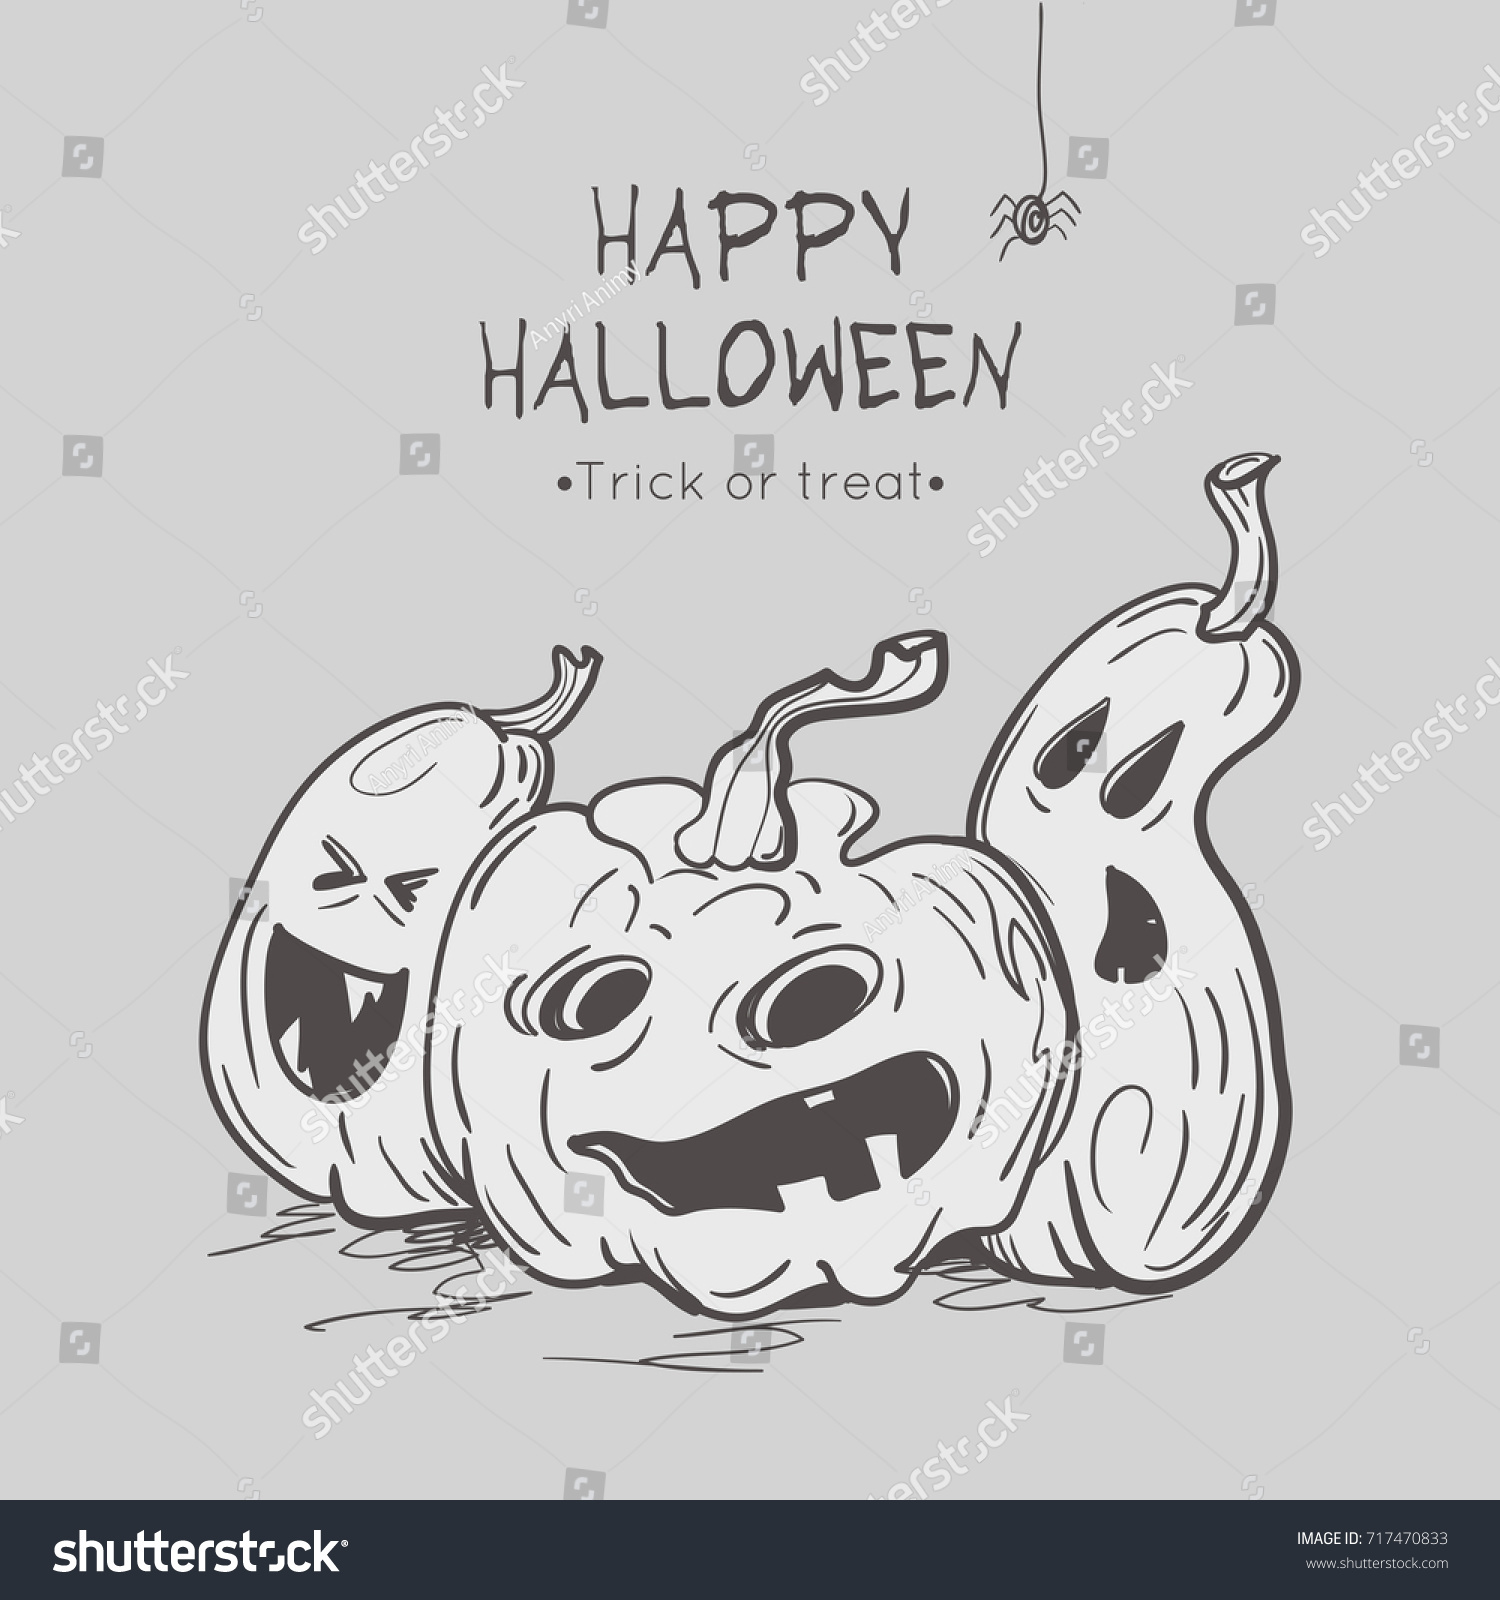 Happy halloween greeting cards pumpkins spider stock vector happy halloween greeting cards with pumpkins and spider template for halloween design vector illustration kristyandbryce Images